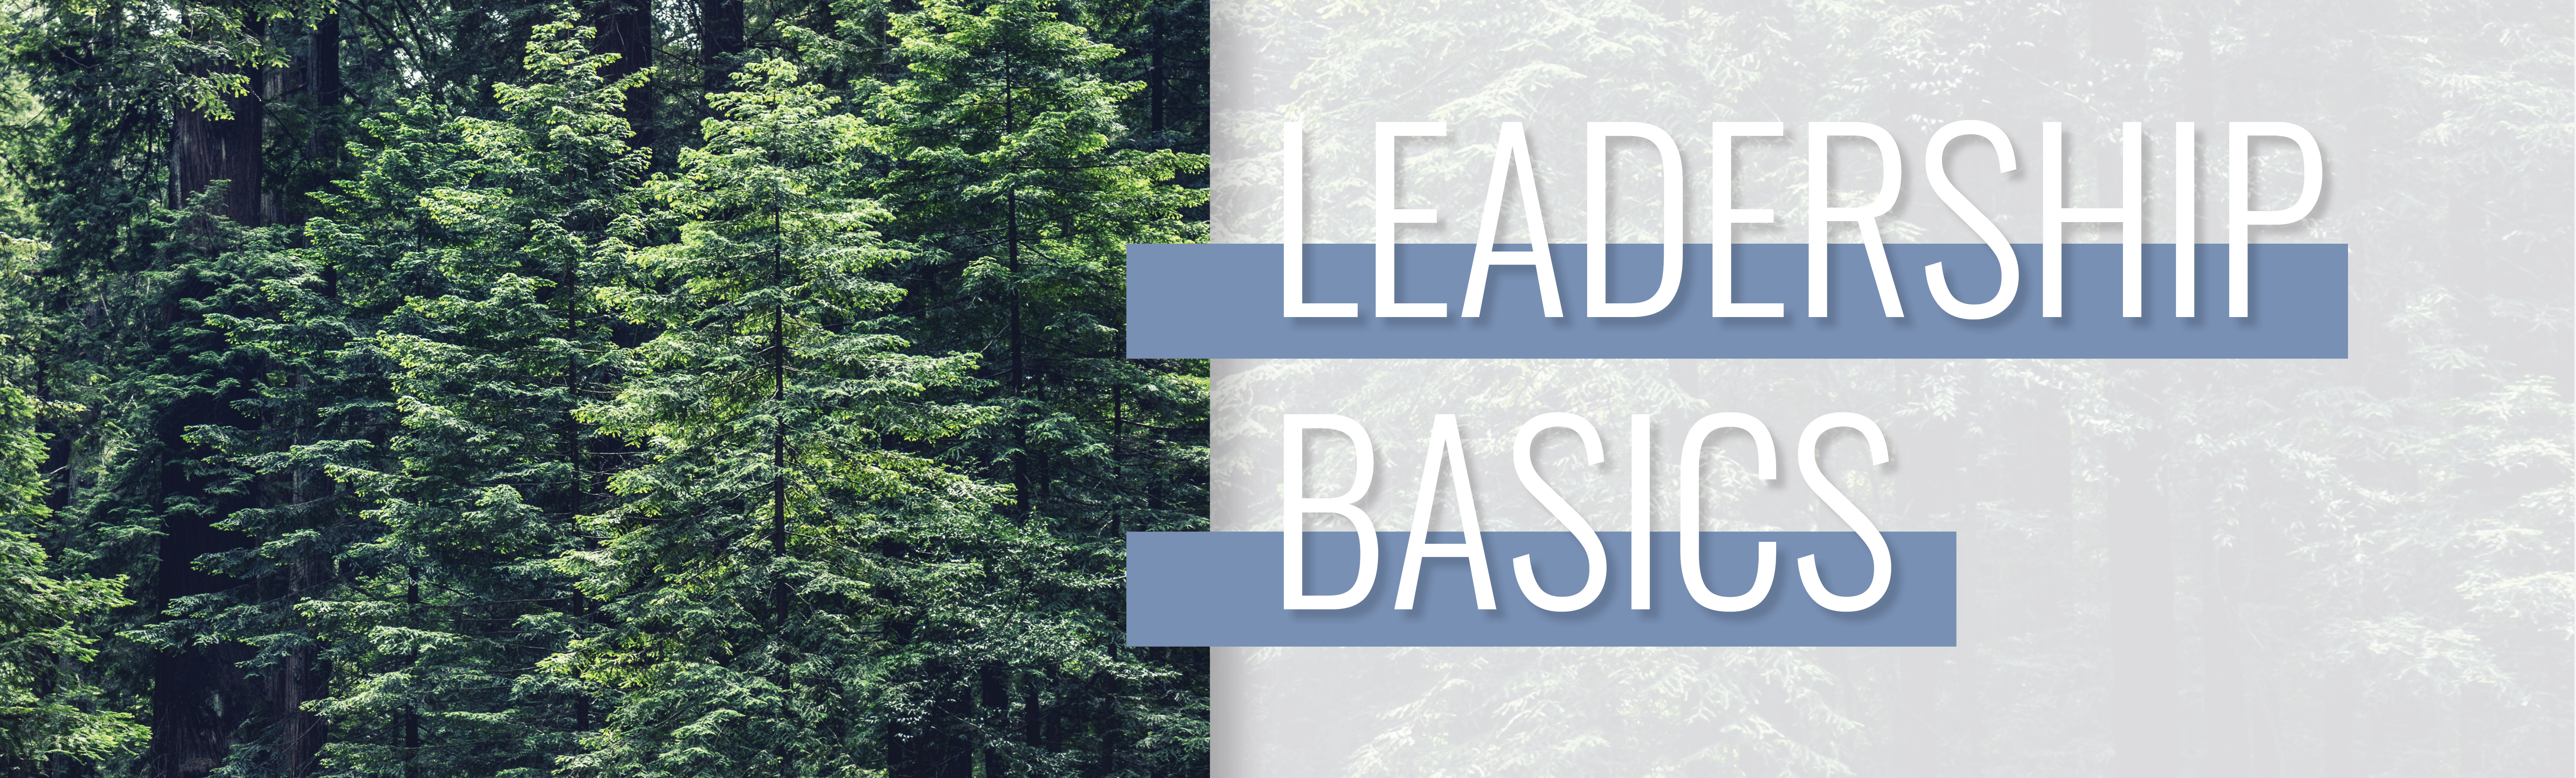 BCF_LeadBasics_Web